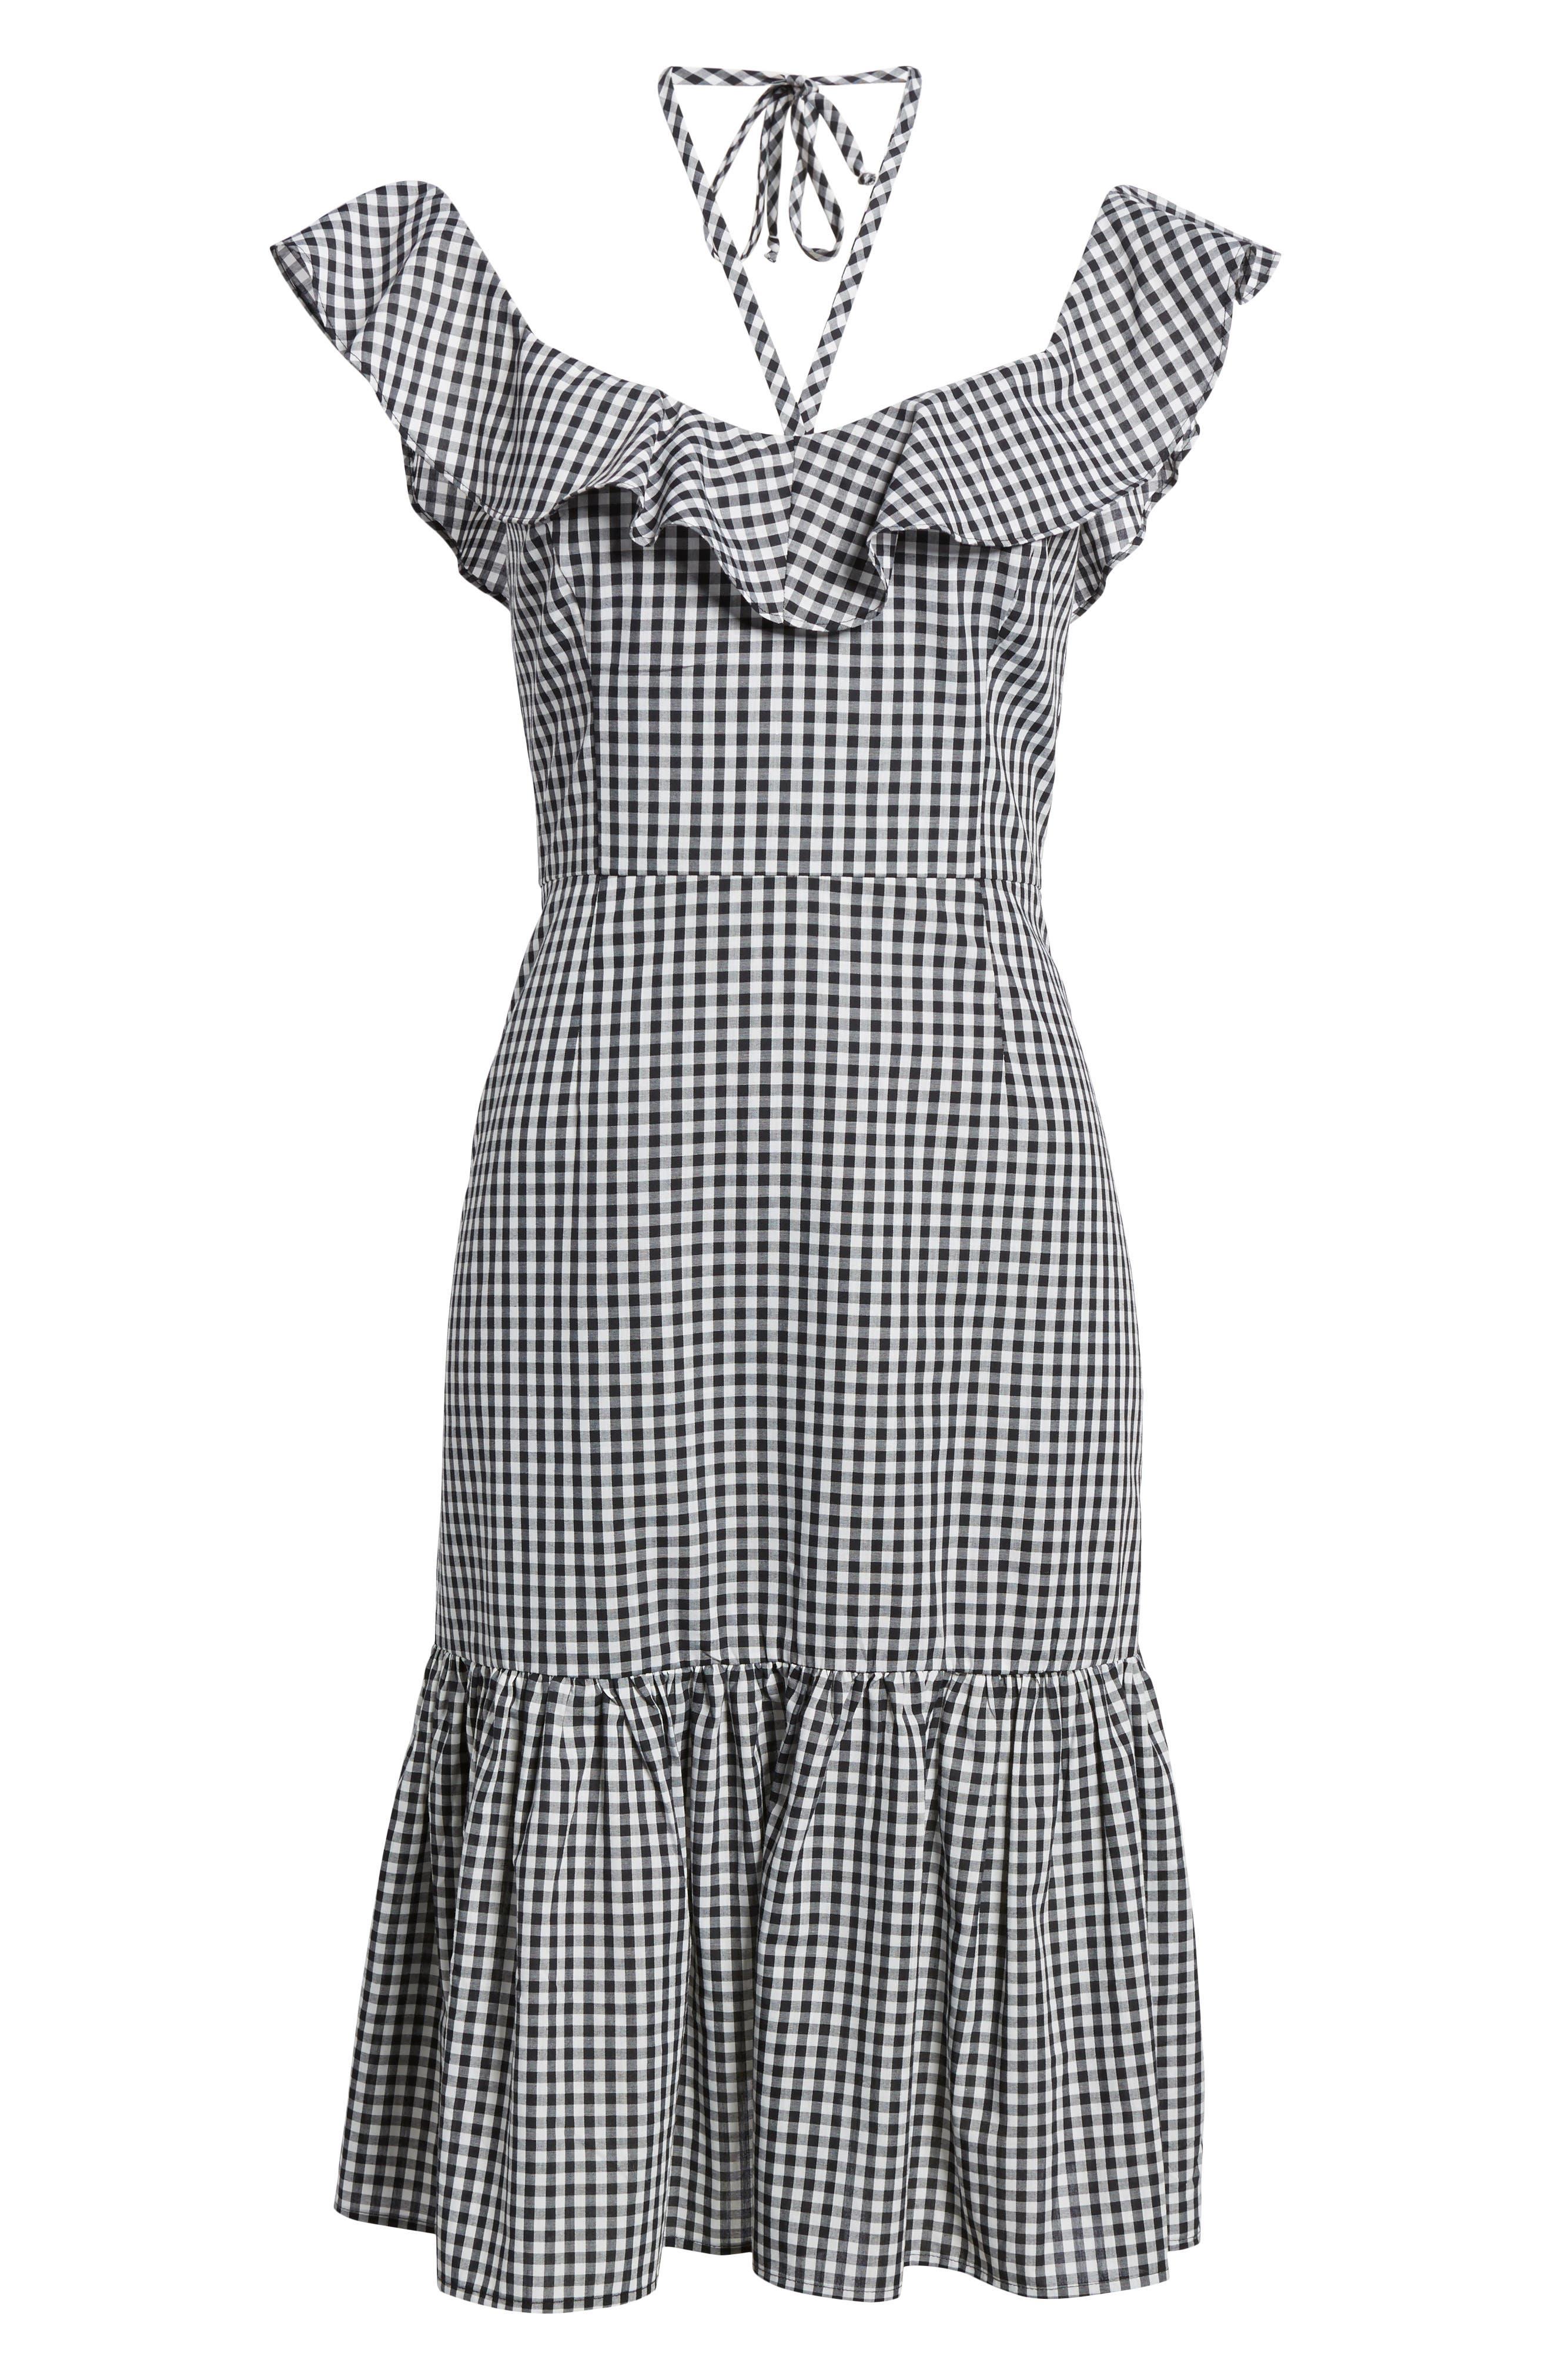 Zander Ruffle Midi Dress,                             Alternate thumbnail 6, color,                             001